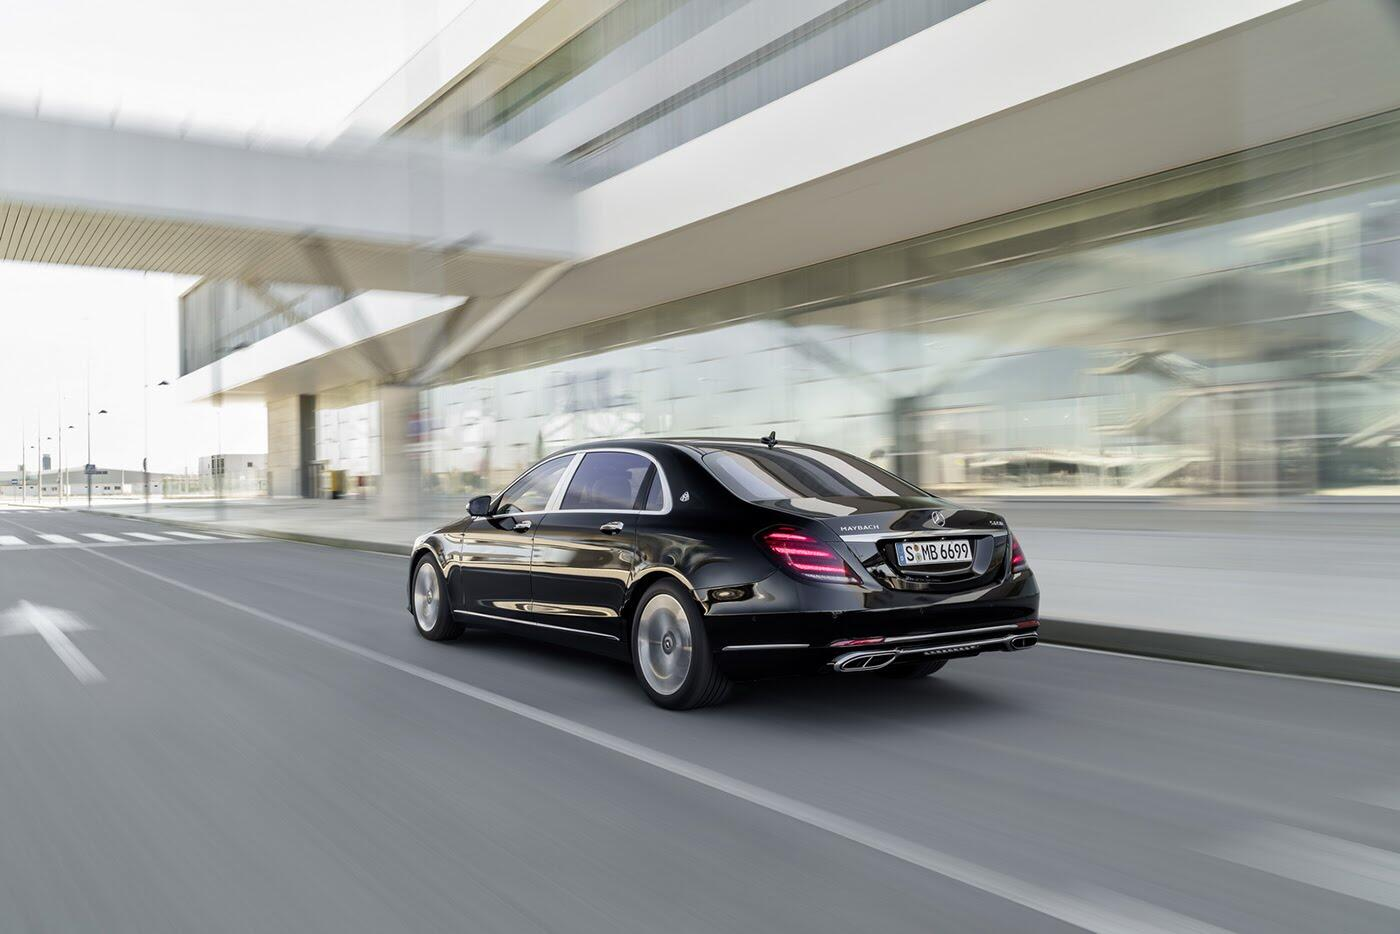 Ảnh chi tiết Mercedes-Benz S-Class 2018 - Hình 5